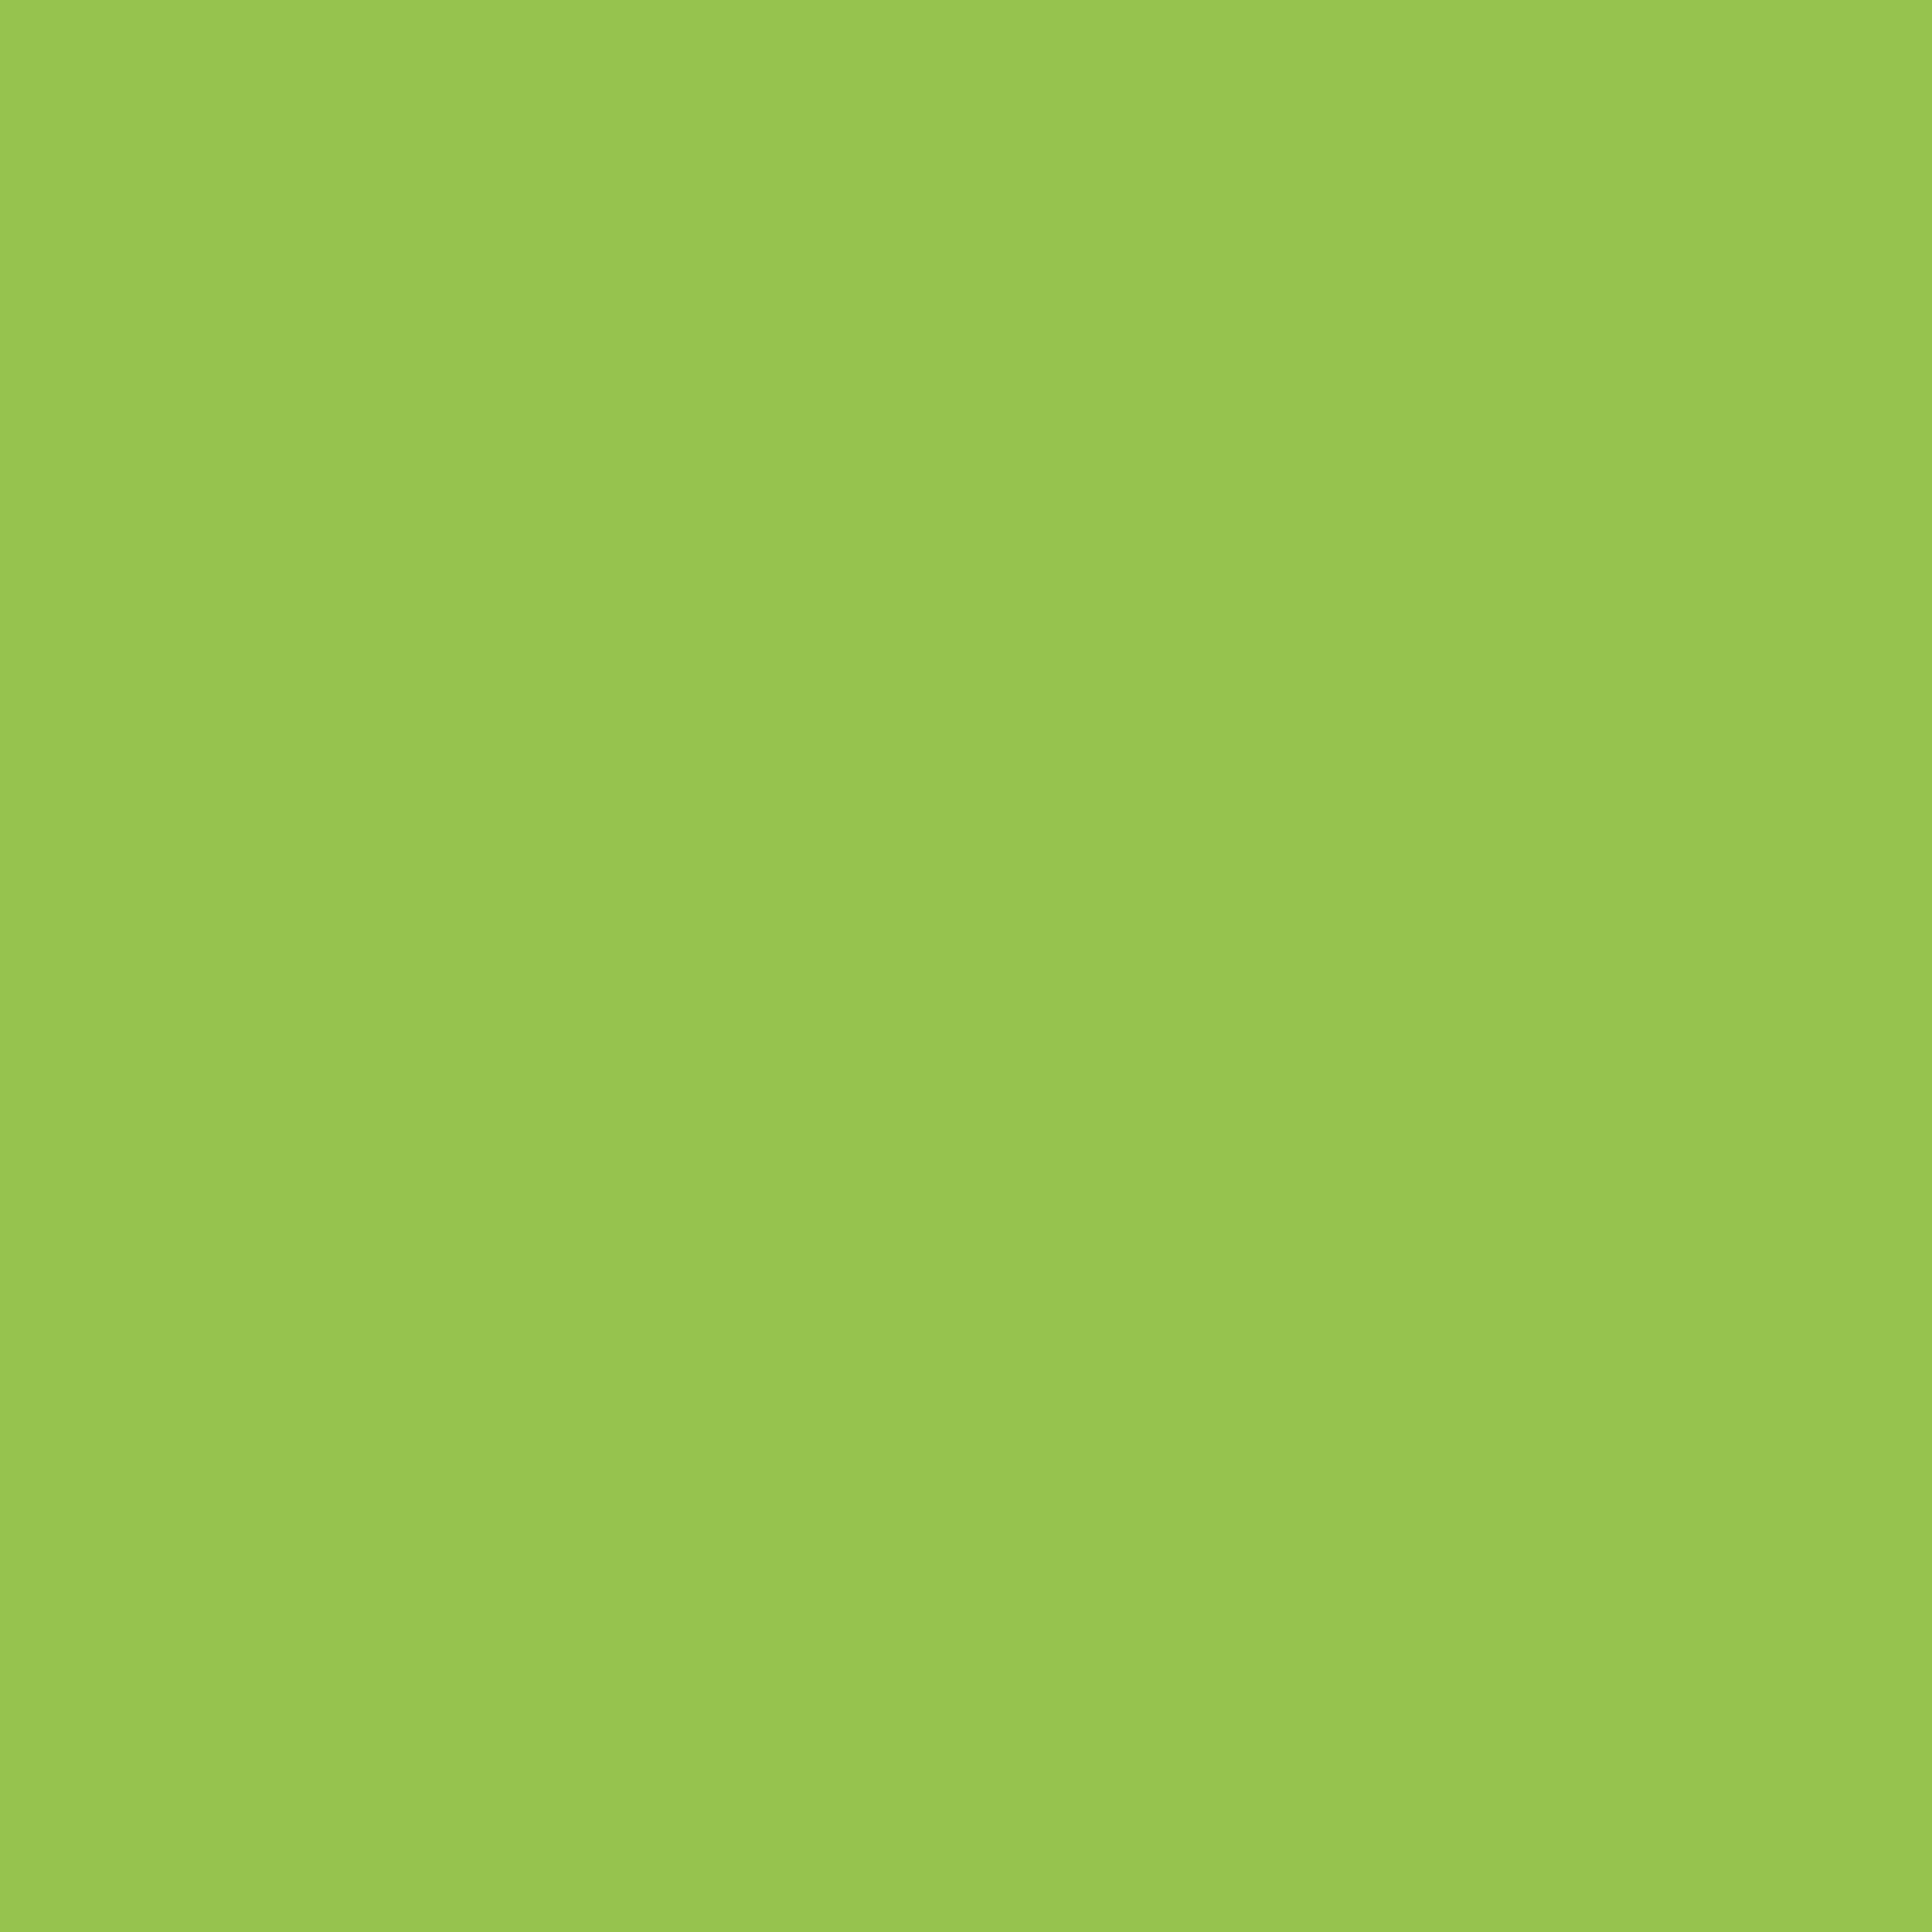 Cactus-lime